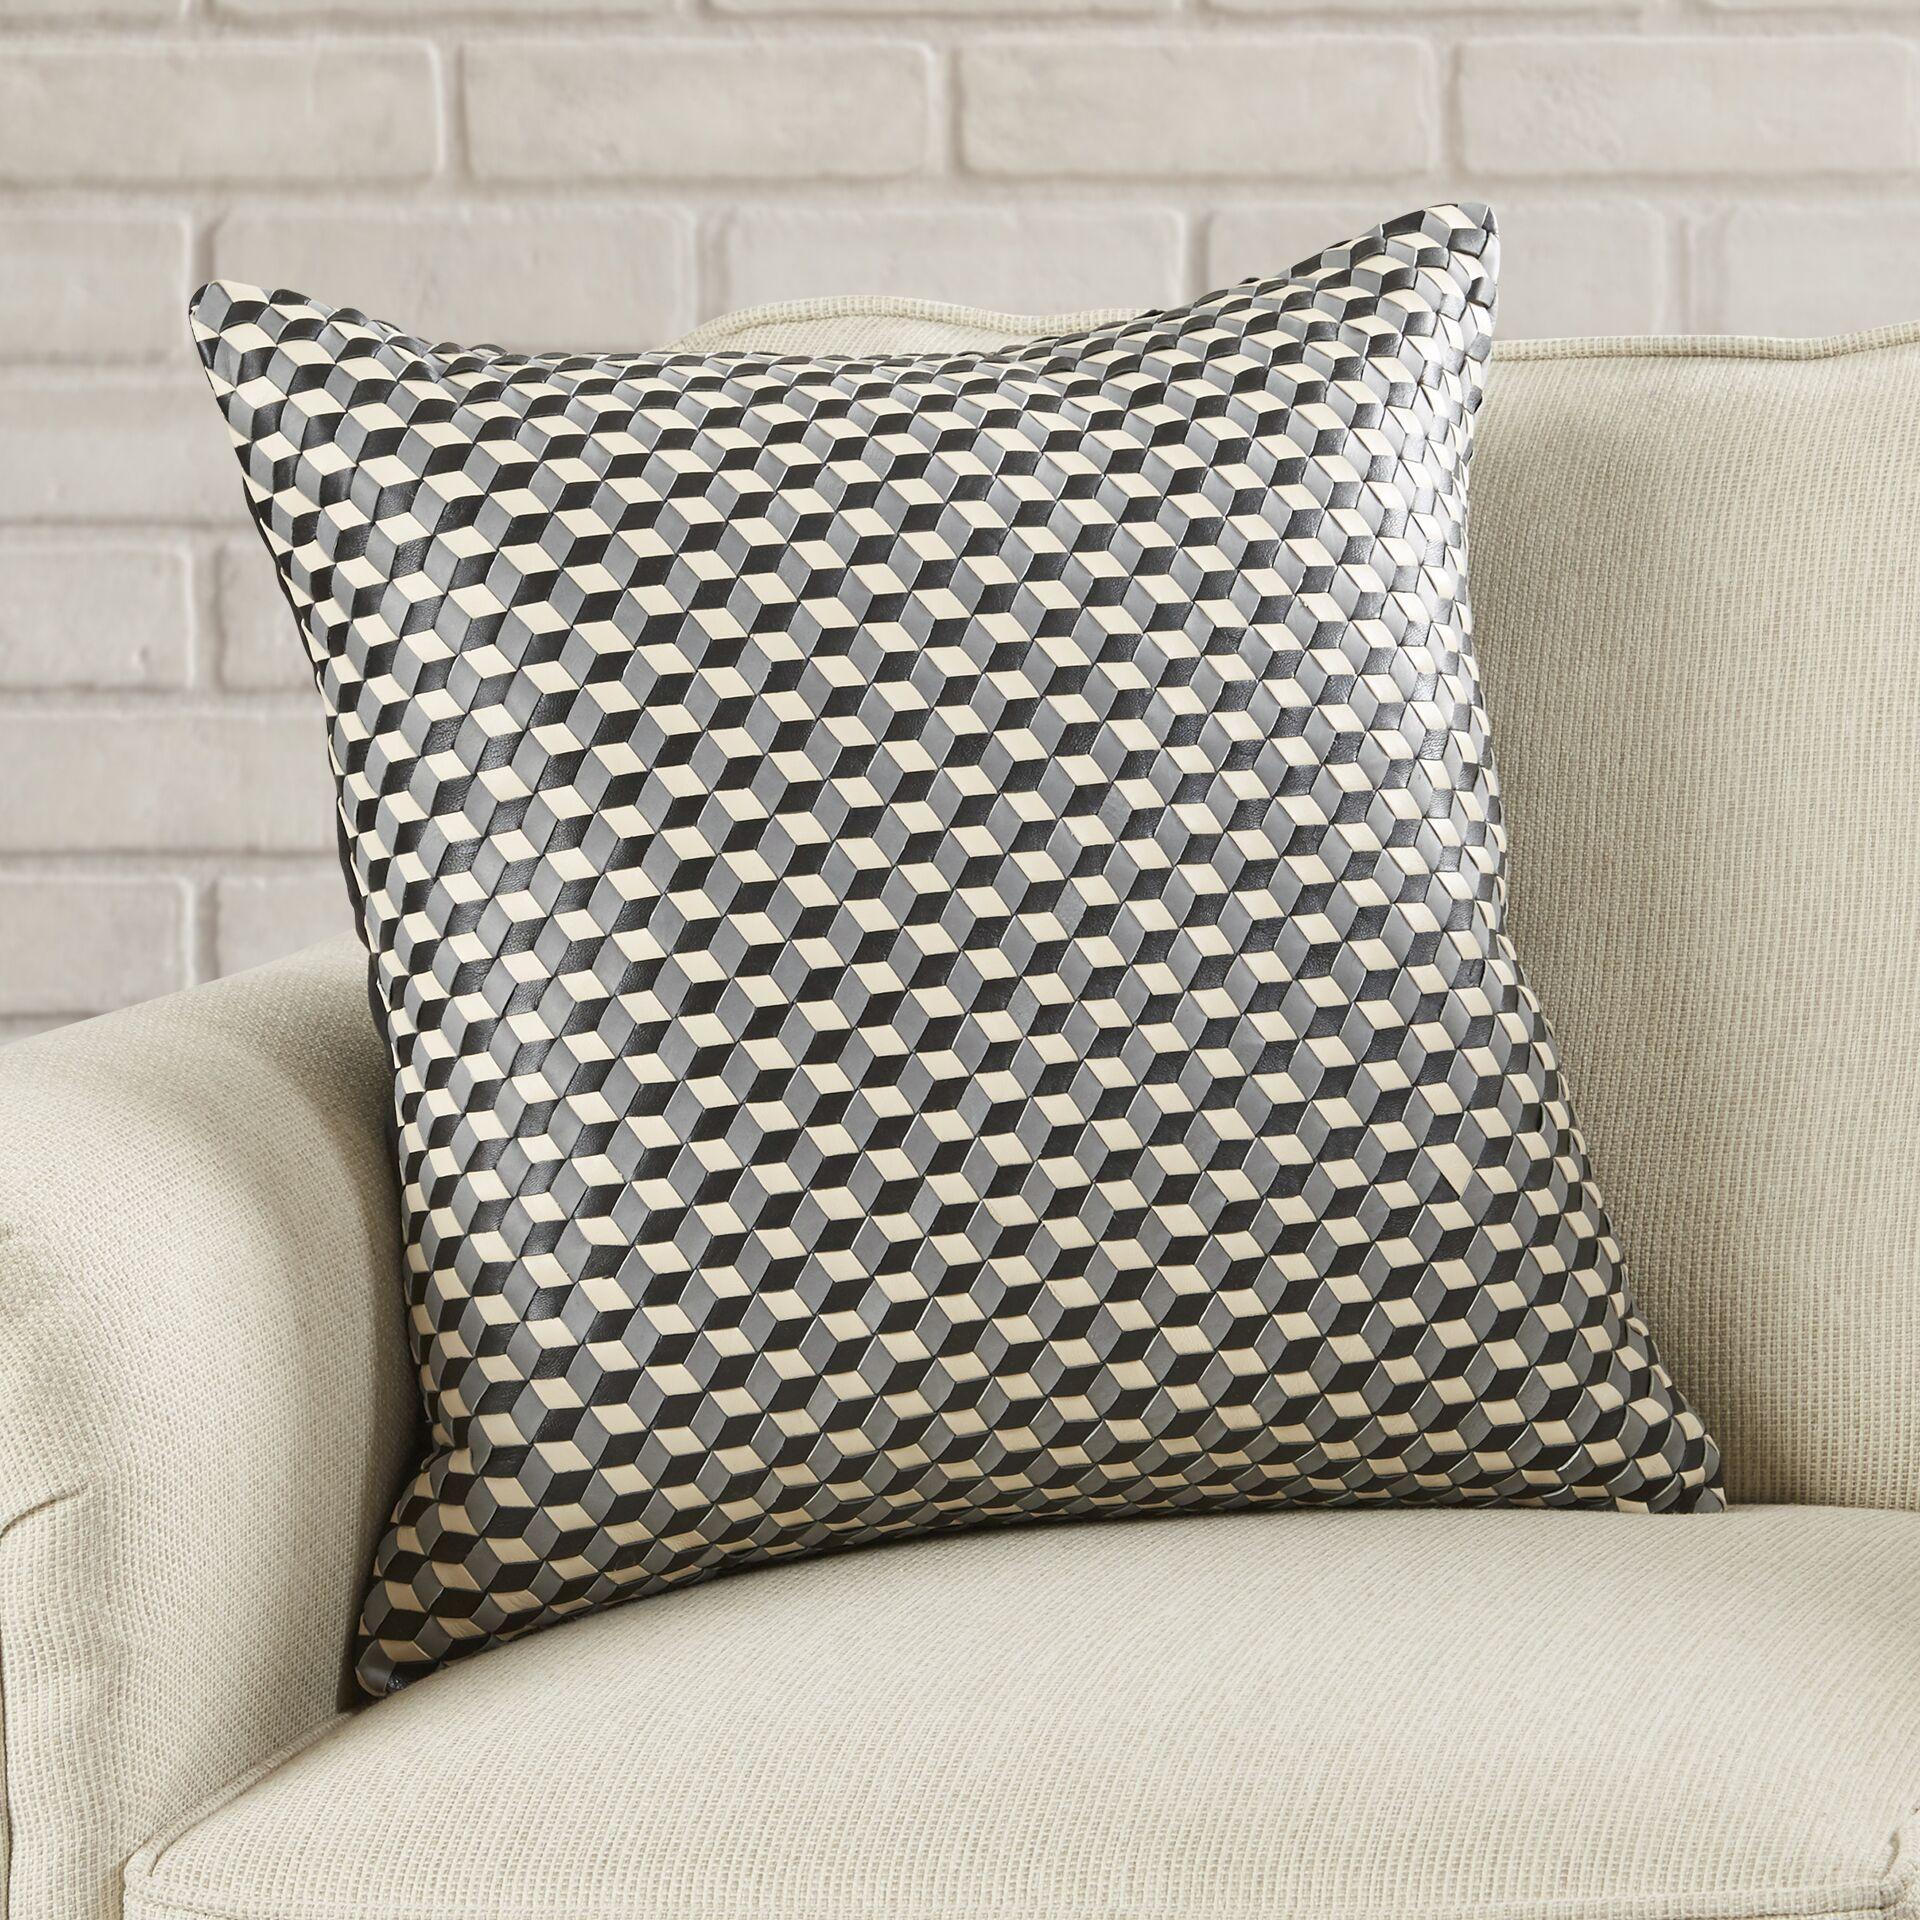 Kadence Woven Cubes Leather Throw Pillow